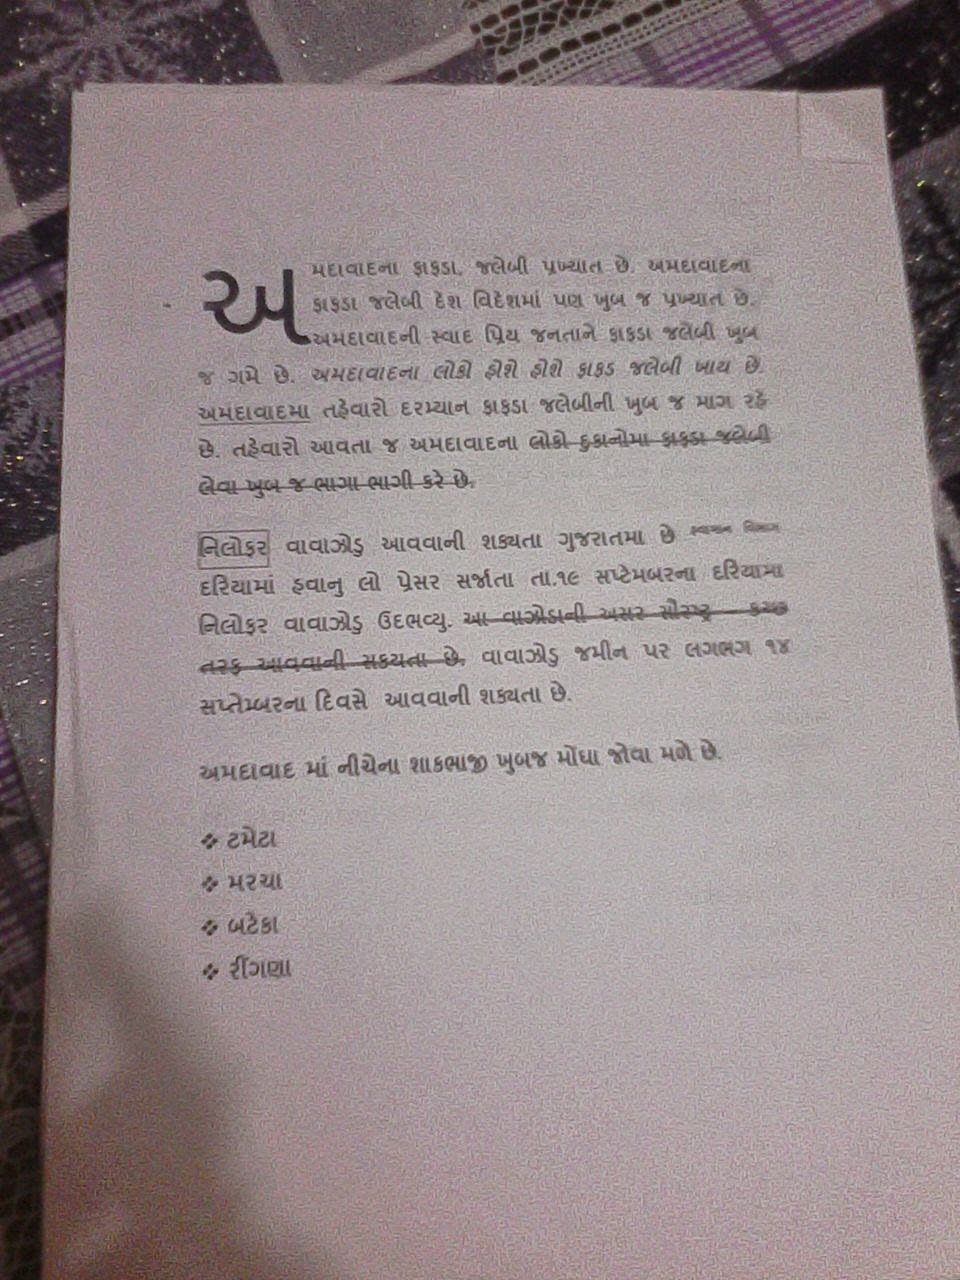 Practice paragraph typing array aras paras badli gtu ccc exam gujarati fakro rh jnpatel09 blogspot com fandeluxe Choice Image